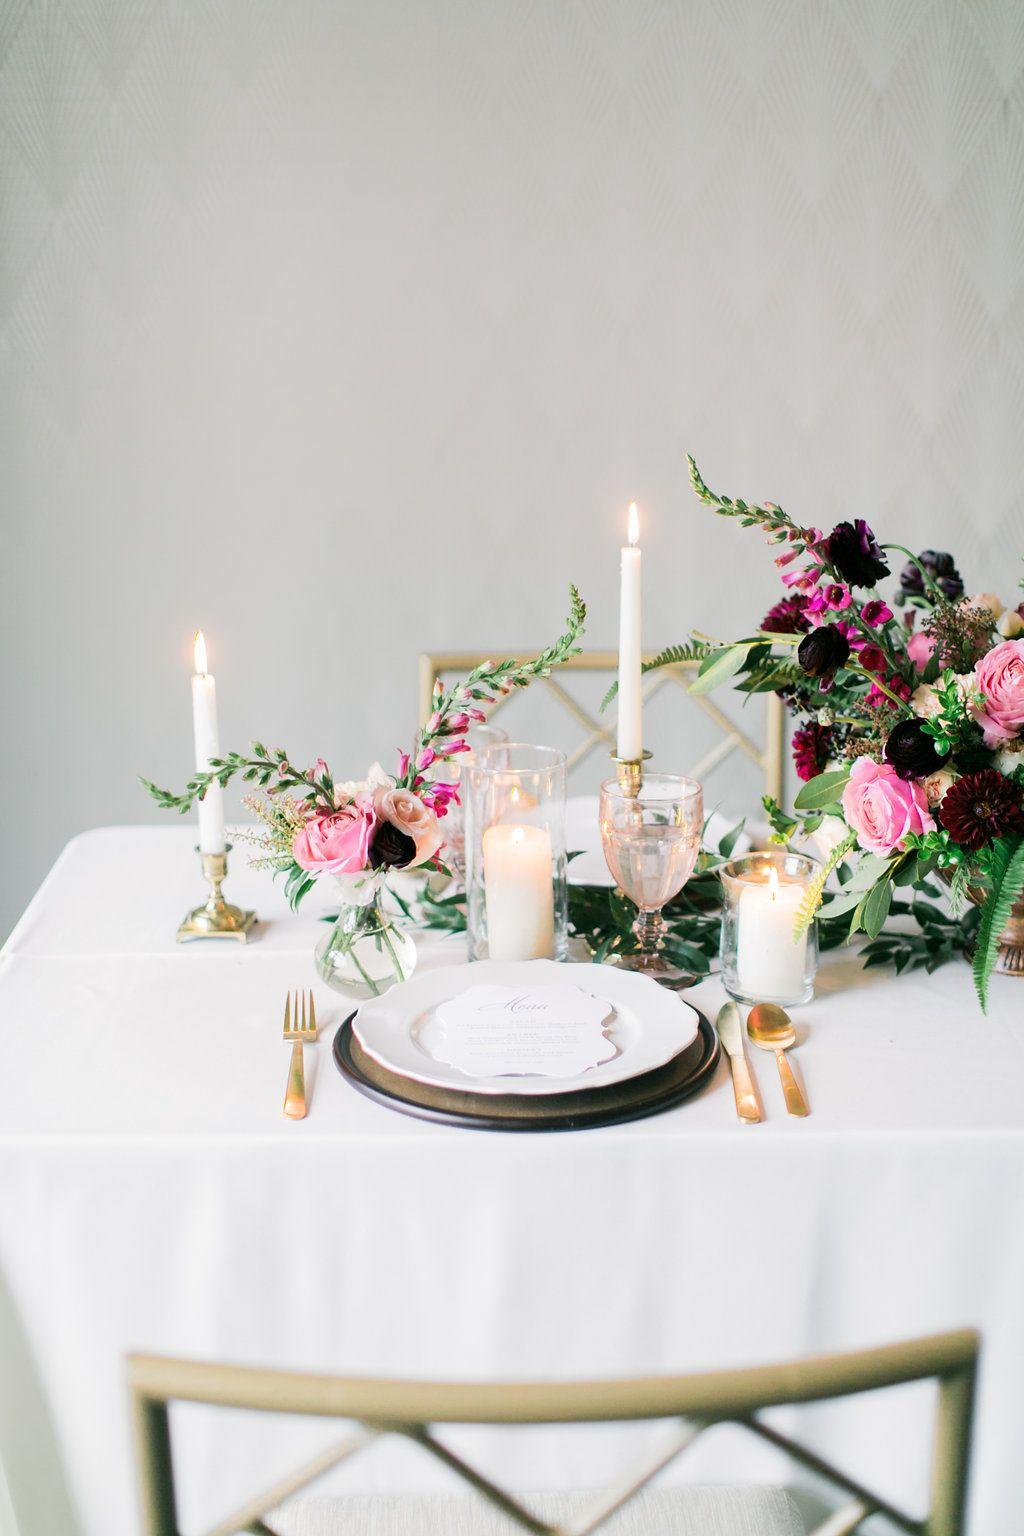 Table Ideas in 2020 Martha stewart weddings, Table